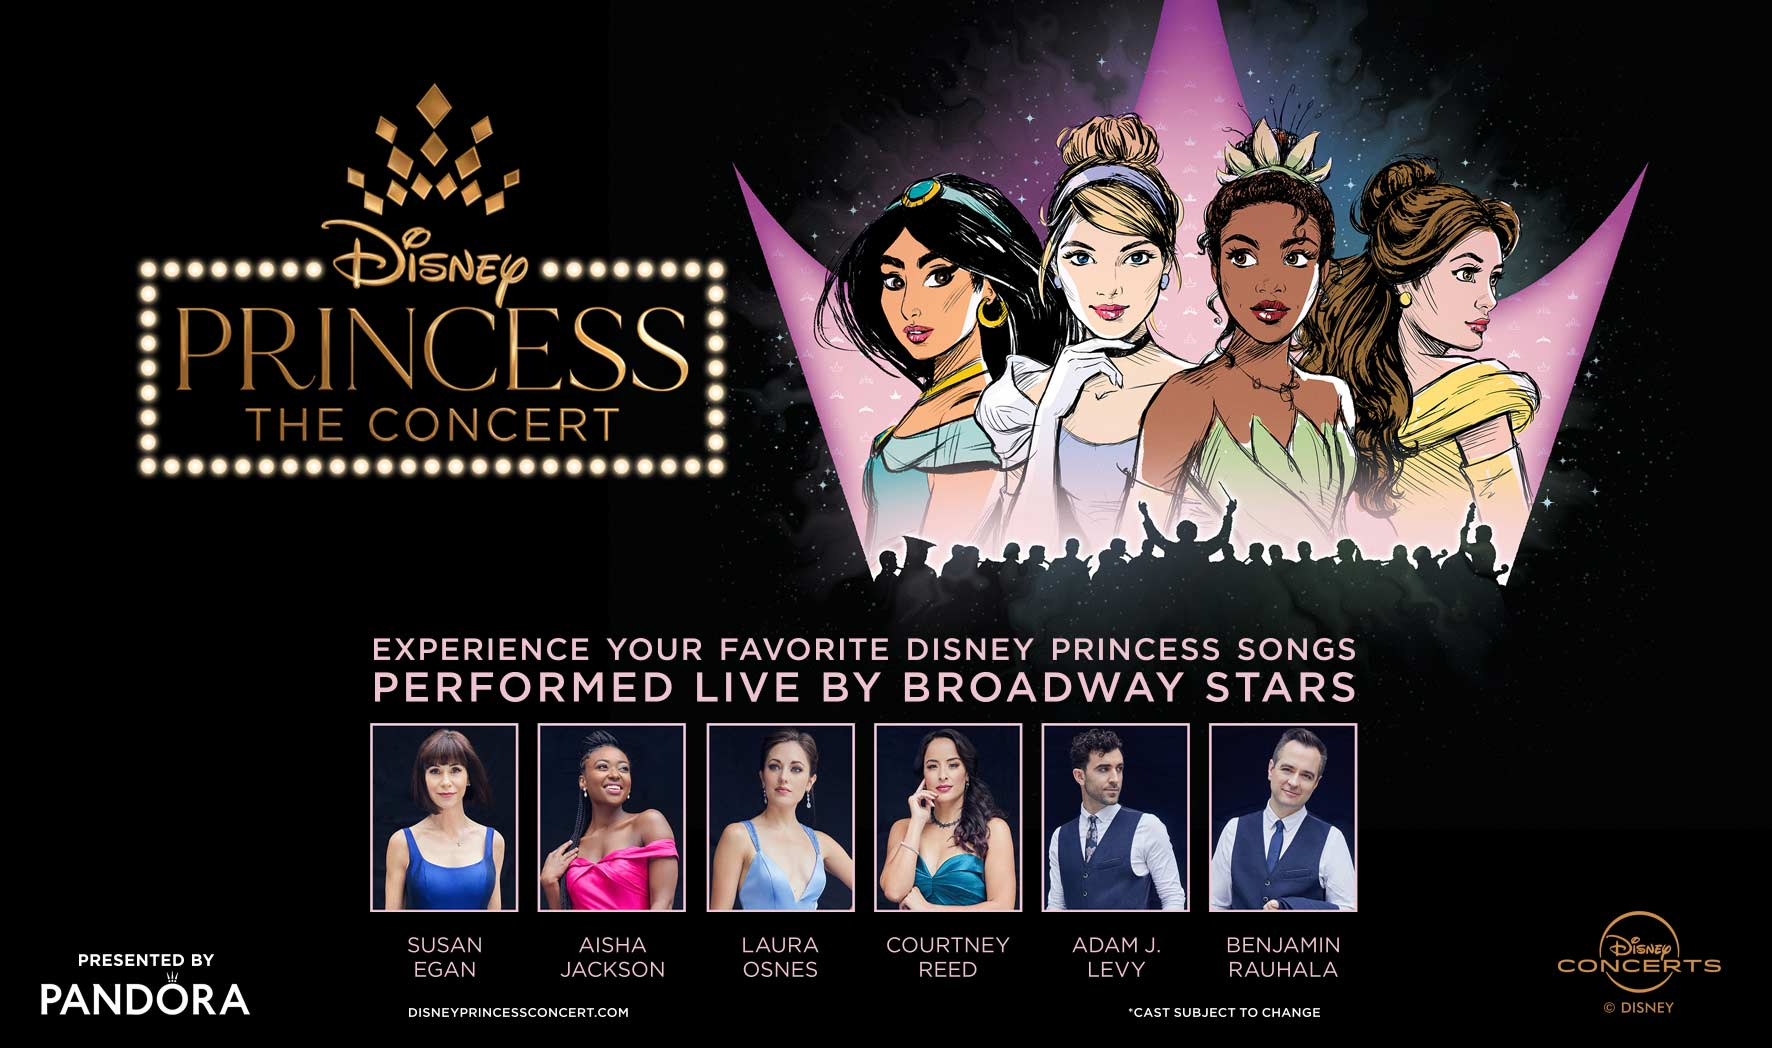 Pandora Presents Disney Princess - The Concert